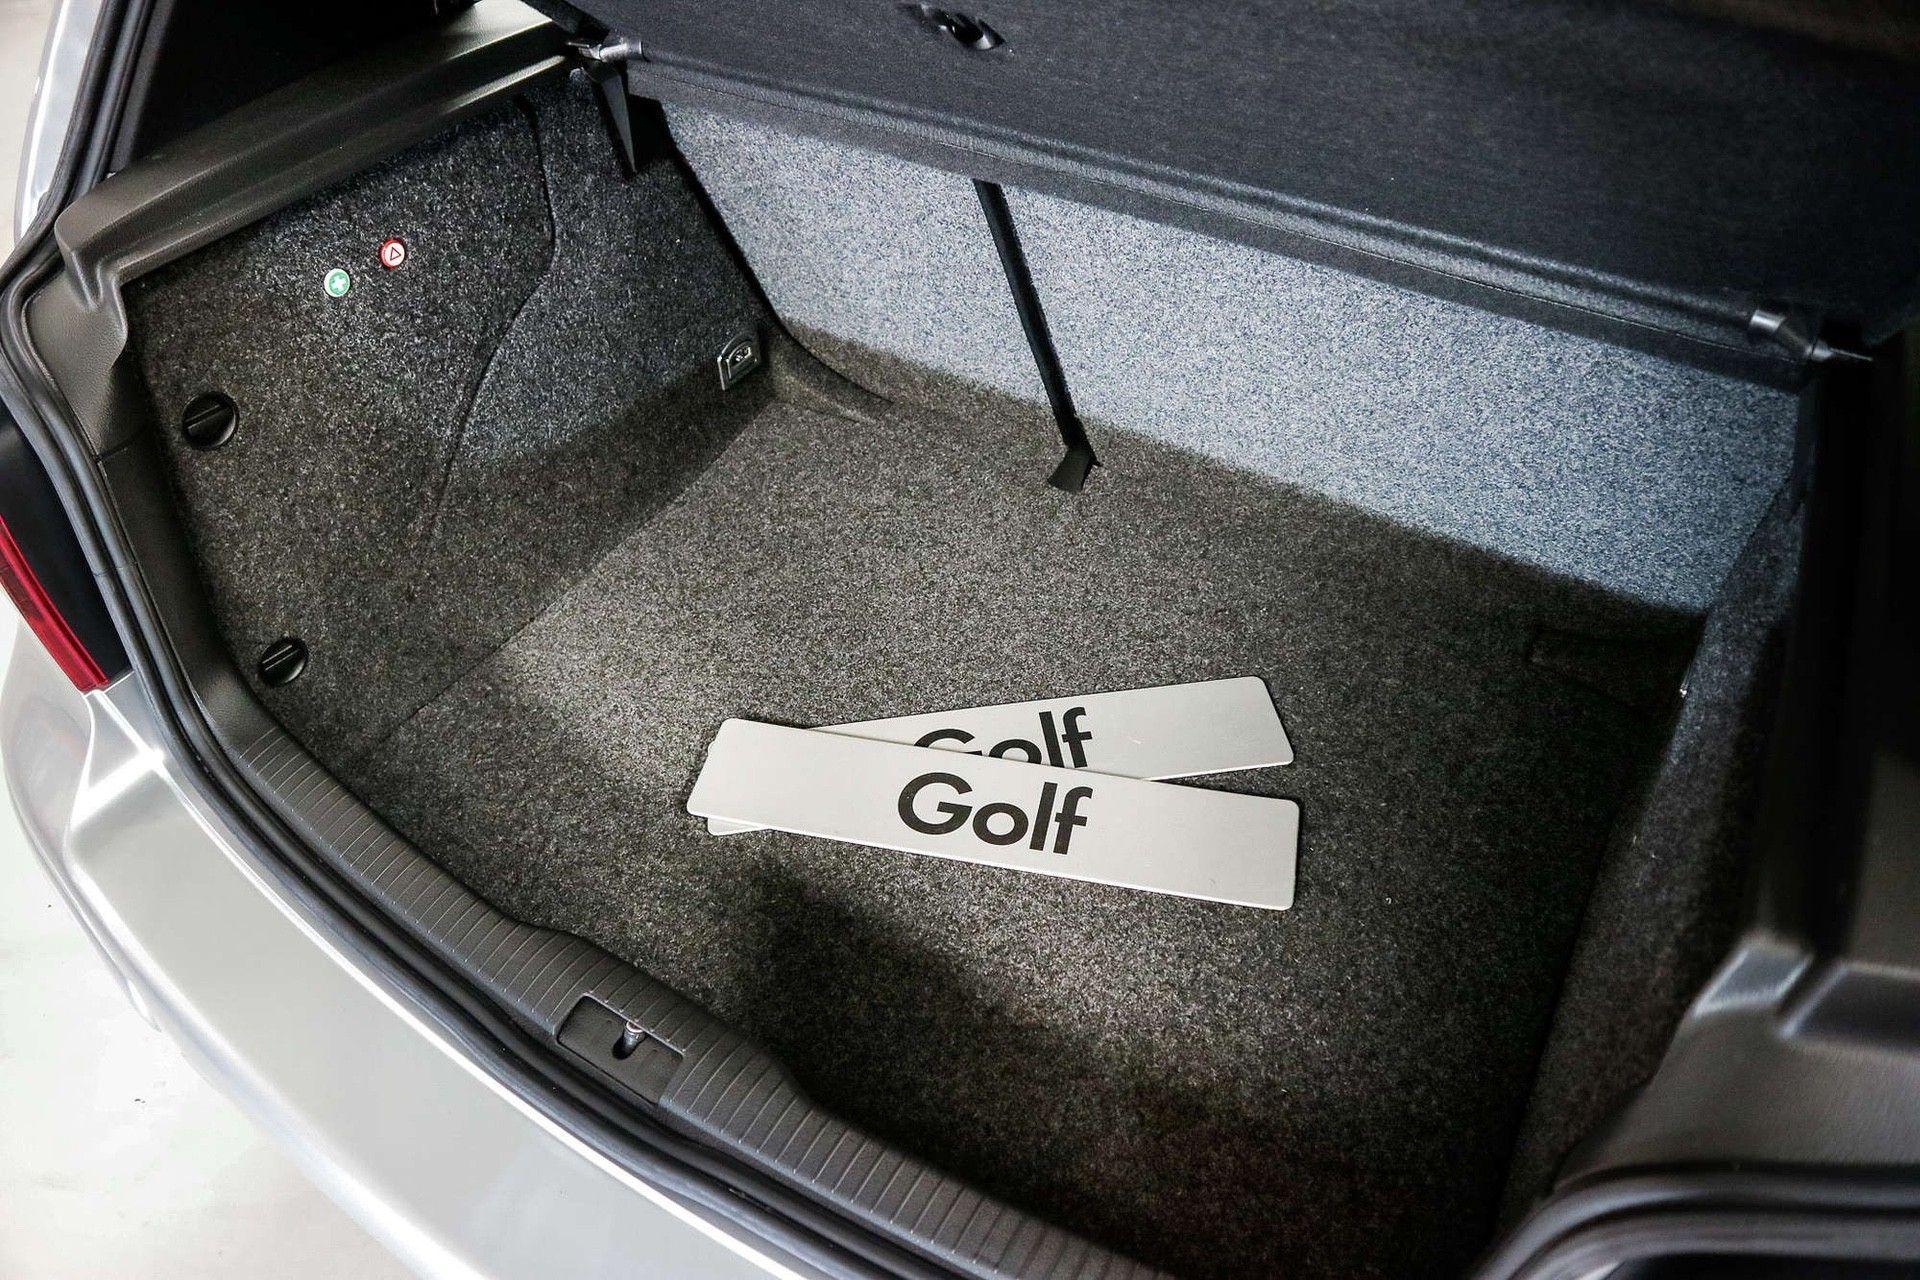 2002_VW_Golf_GTI_25th_Anniversary_Edition_sale-0013